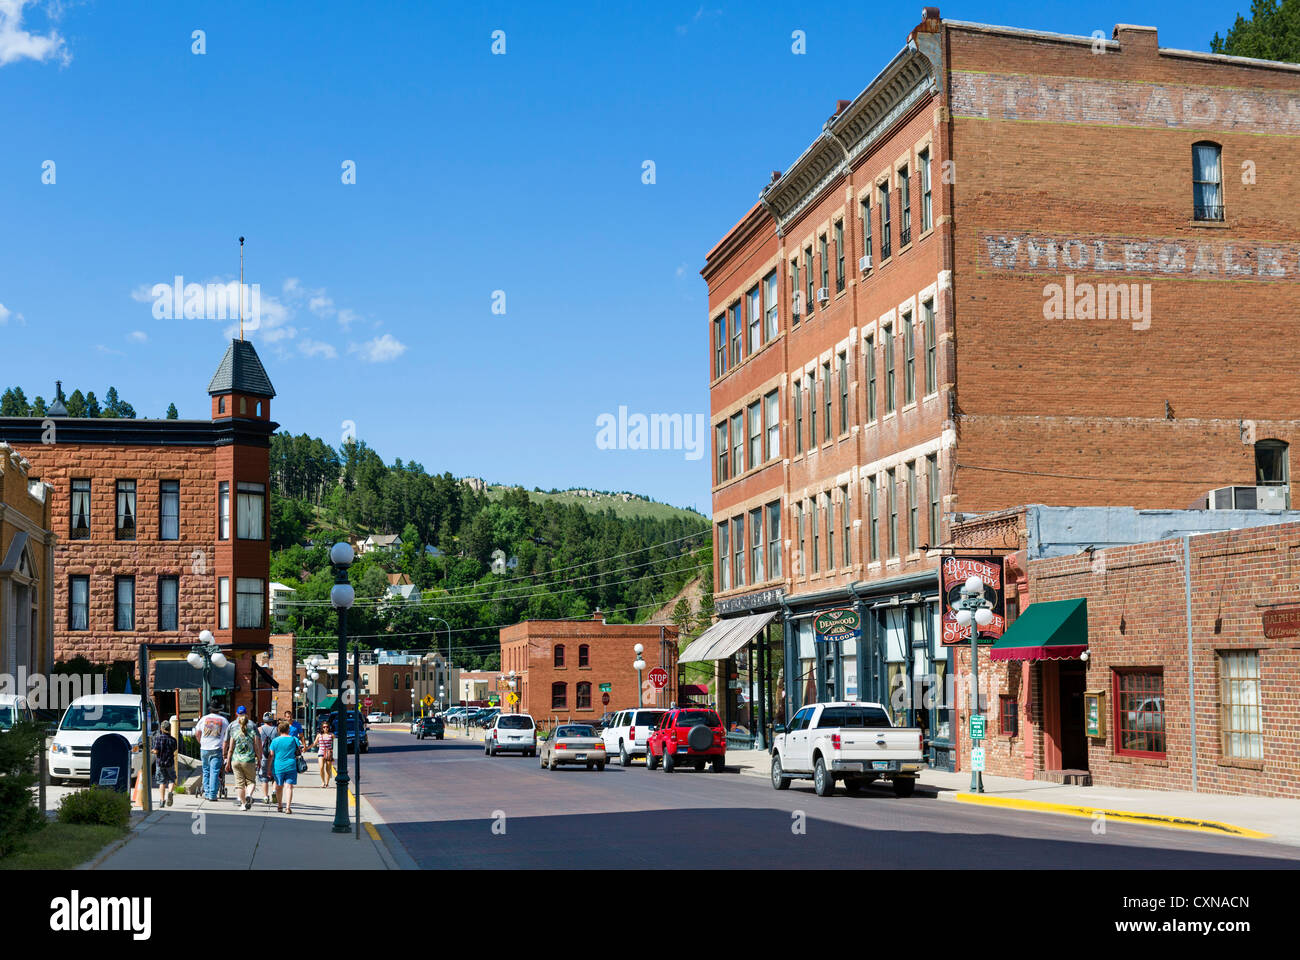 Sherman Street in the historic town of Deadwood, South Dakota, USA - Stock Image